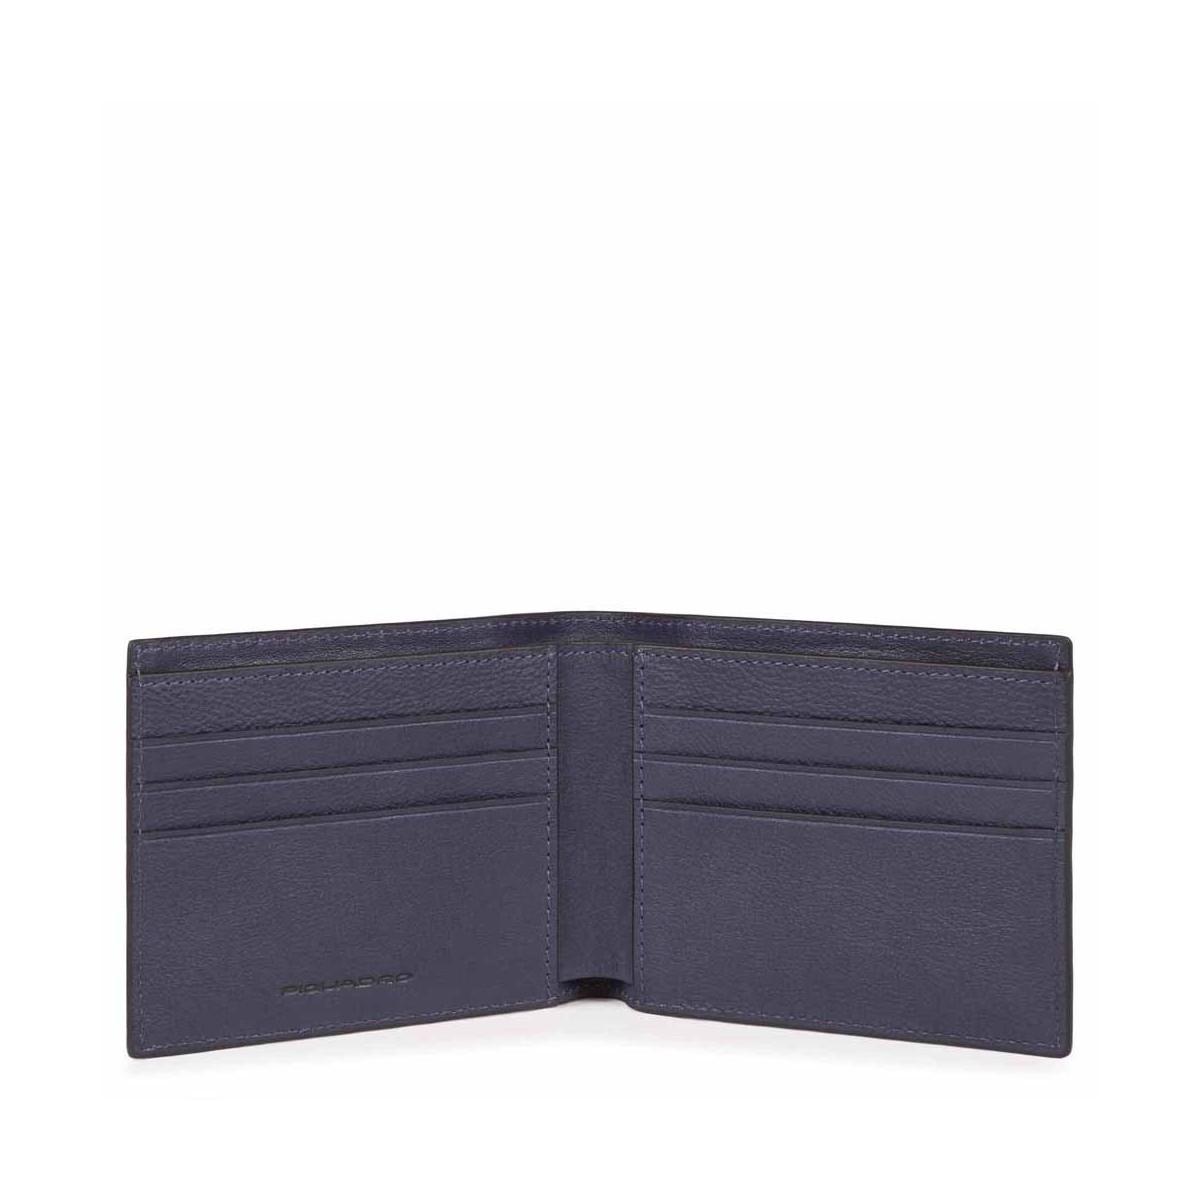 PIQUADRO Black Square portafogli uomo 6 cc, RFID, pelle blu